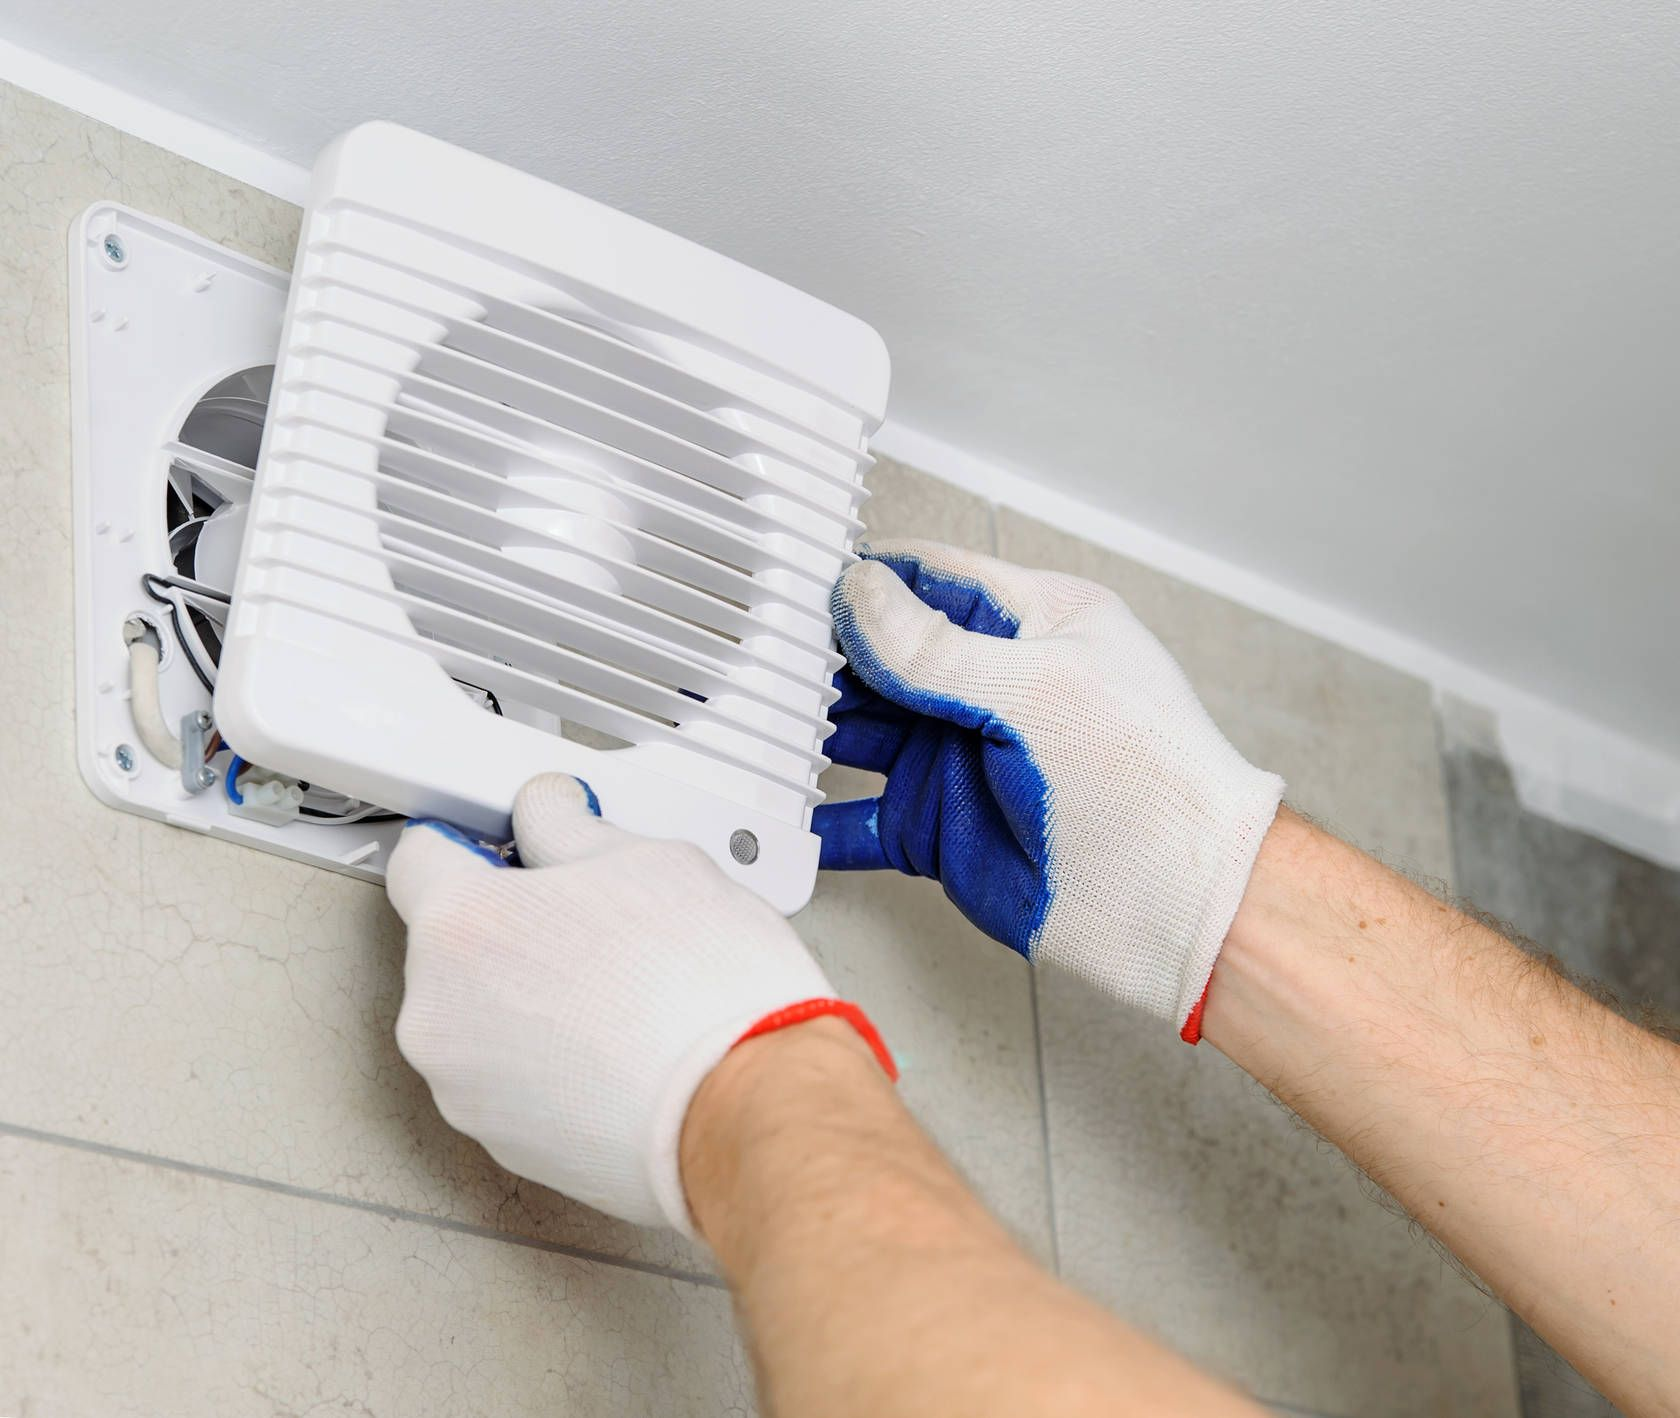 Installation de ventilation dans la salle de bain